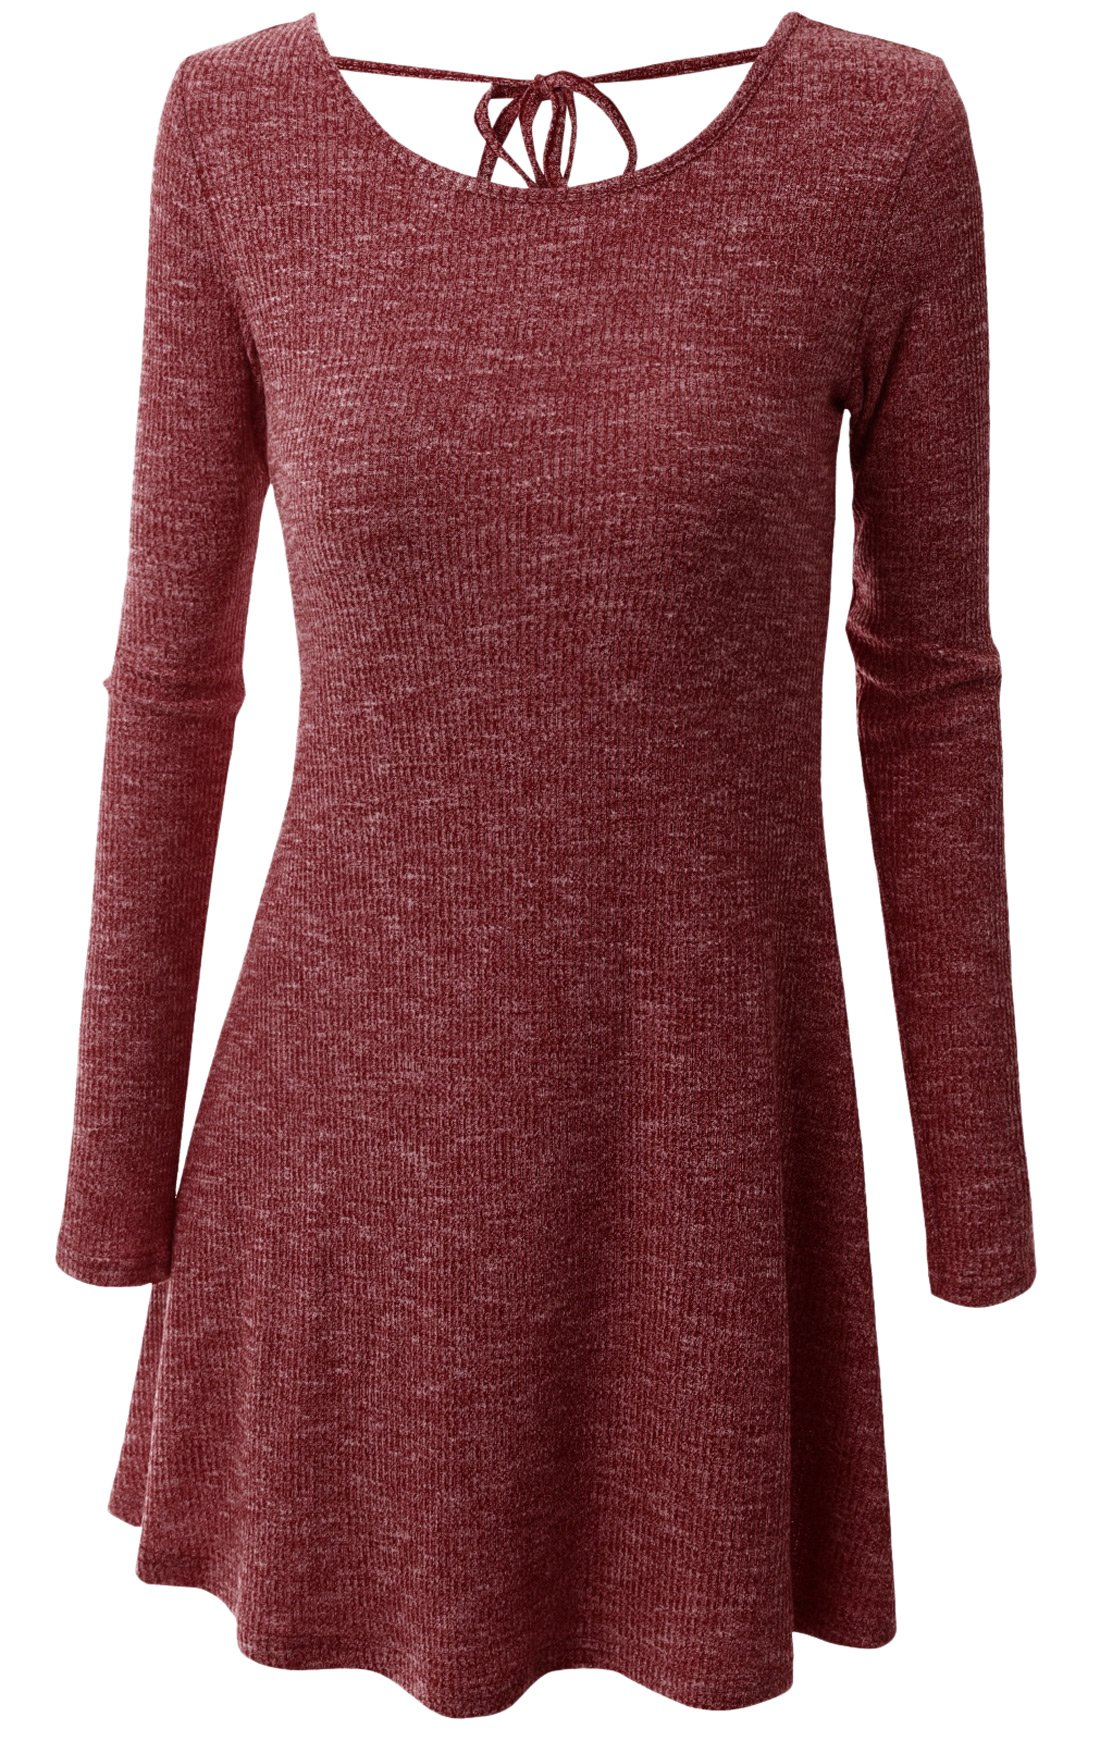 Available at Amazon: chouyatou Women's Stylish Back U-Neck String Shaping Body Long Sleeve Knit Dress